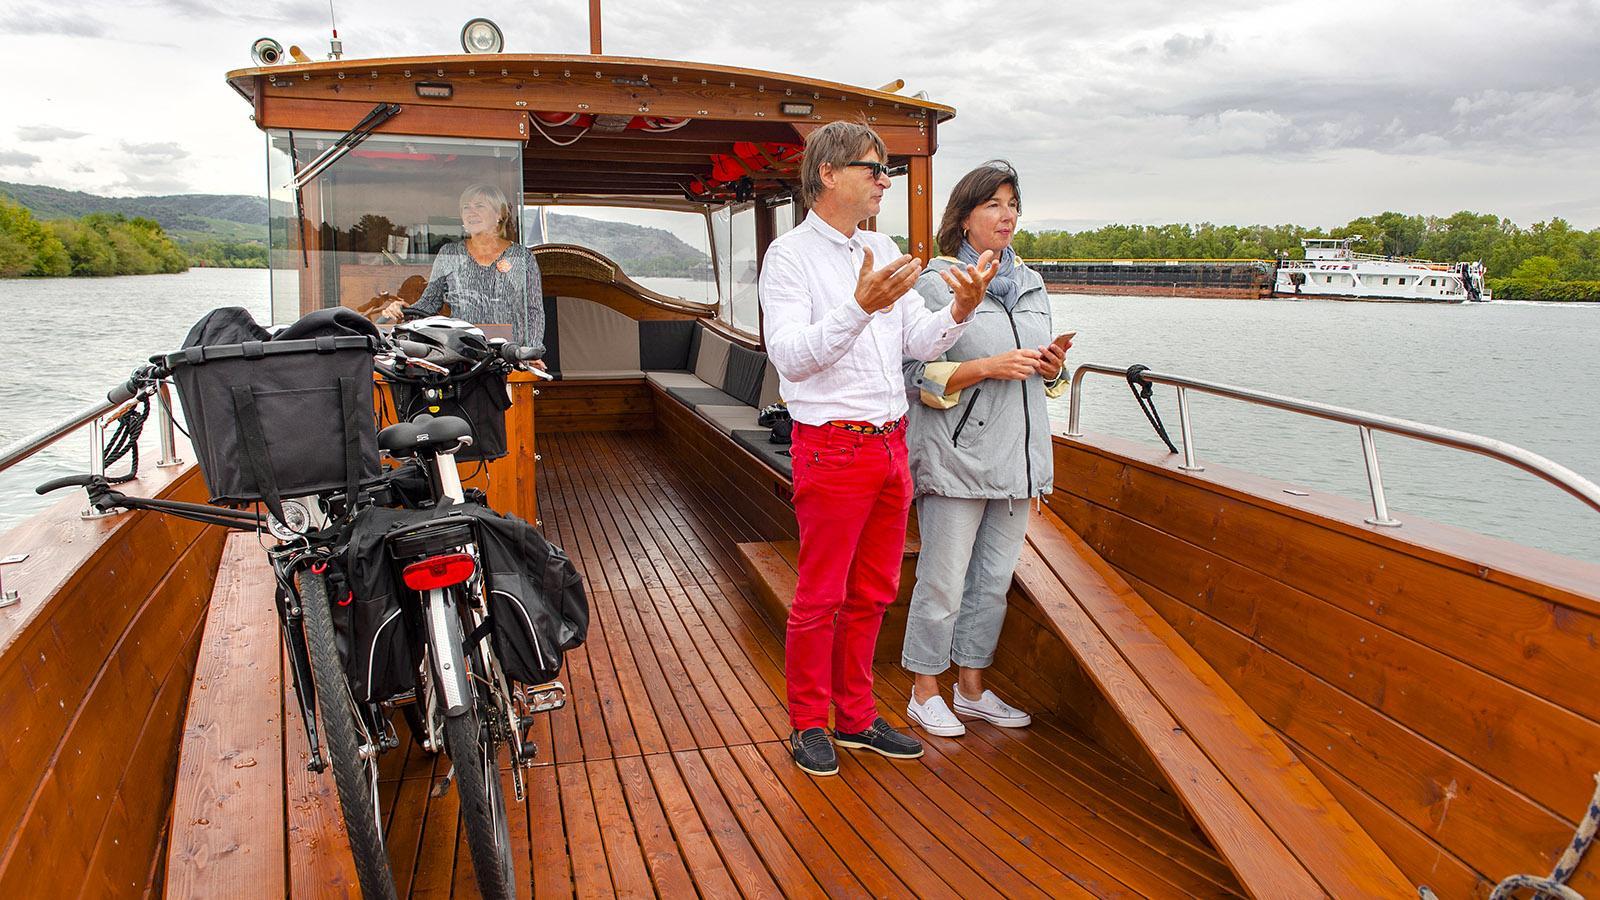 Tournon: Les Canotiers –Bernard Spitz und Véronique Ropp mit Fahrgast. Foto: Hilke Maunder